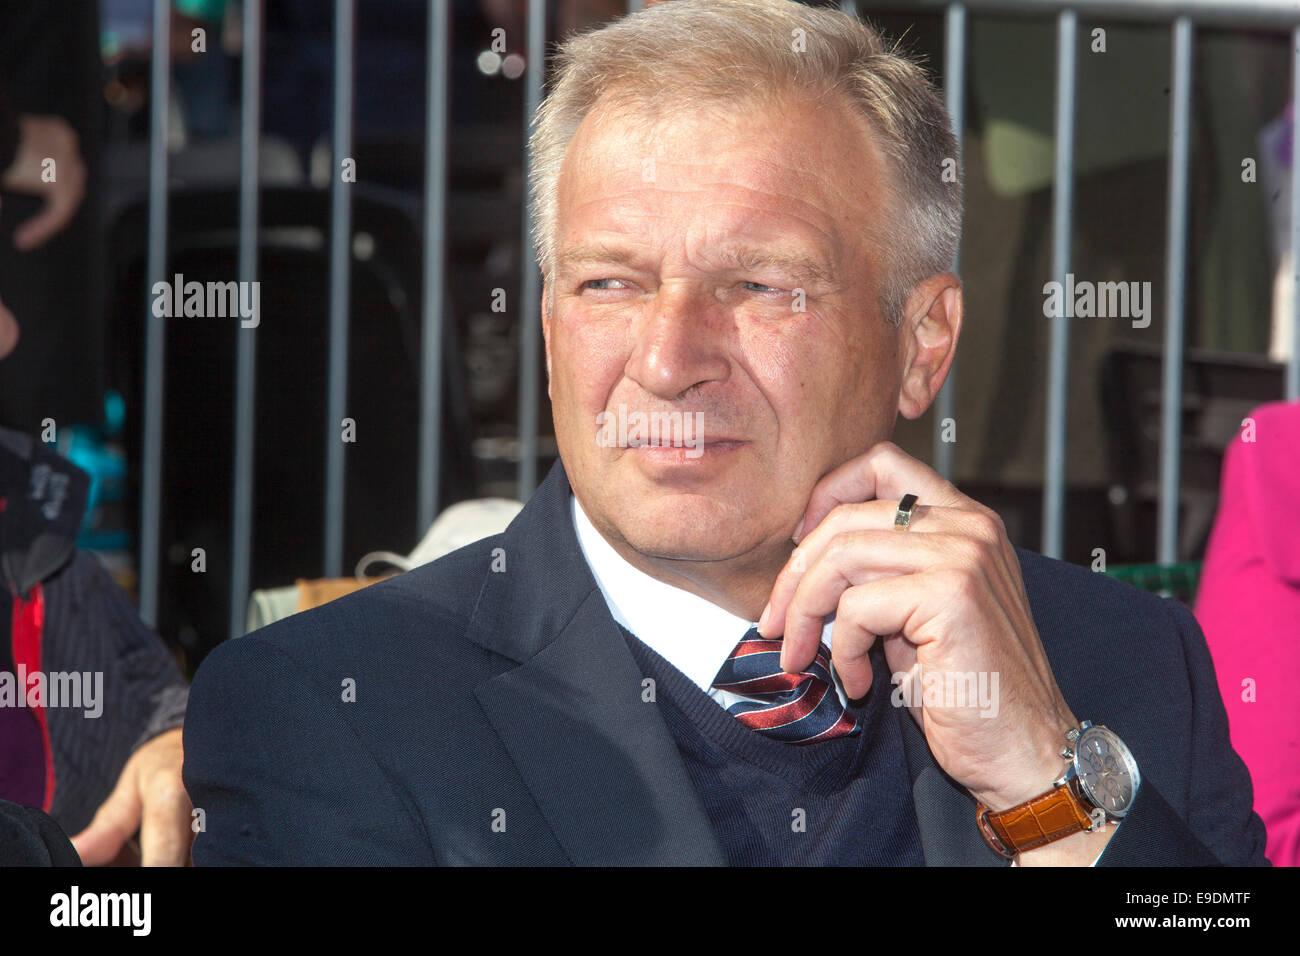 Vlastimil Picek soldier, politician, army general, mayor - Stock Image